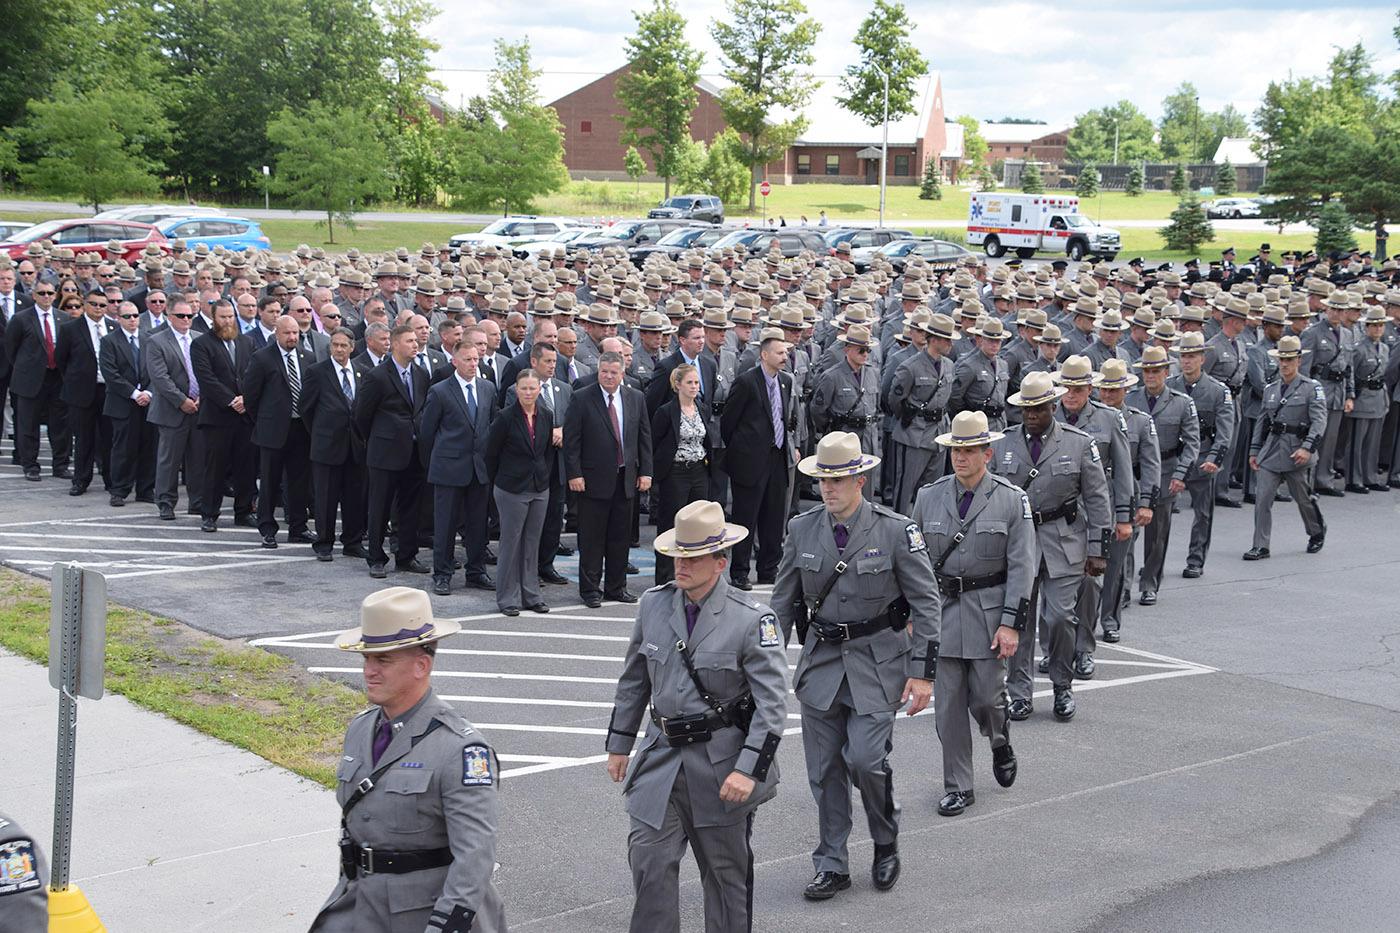 Services set for Nichole Walters, Trooper Joel Davis